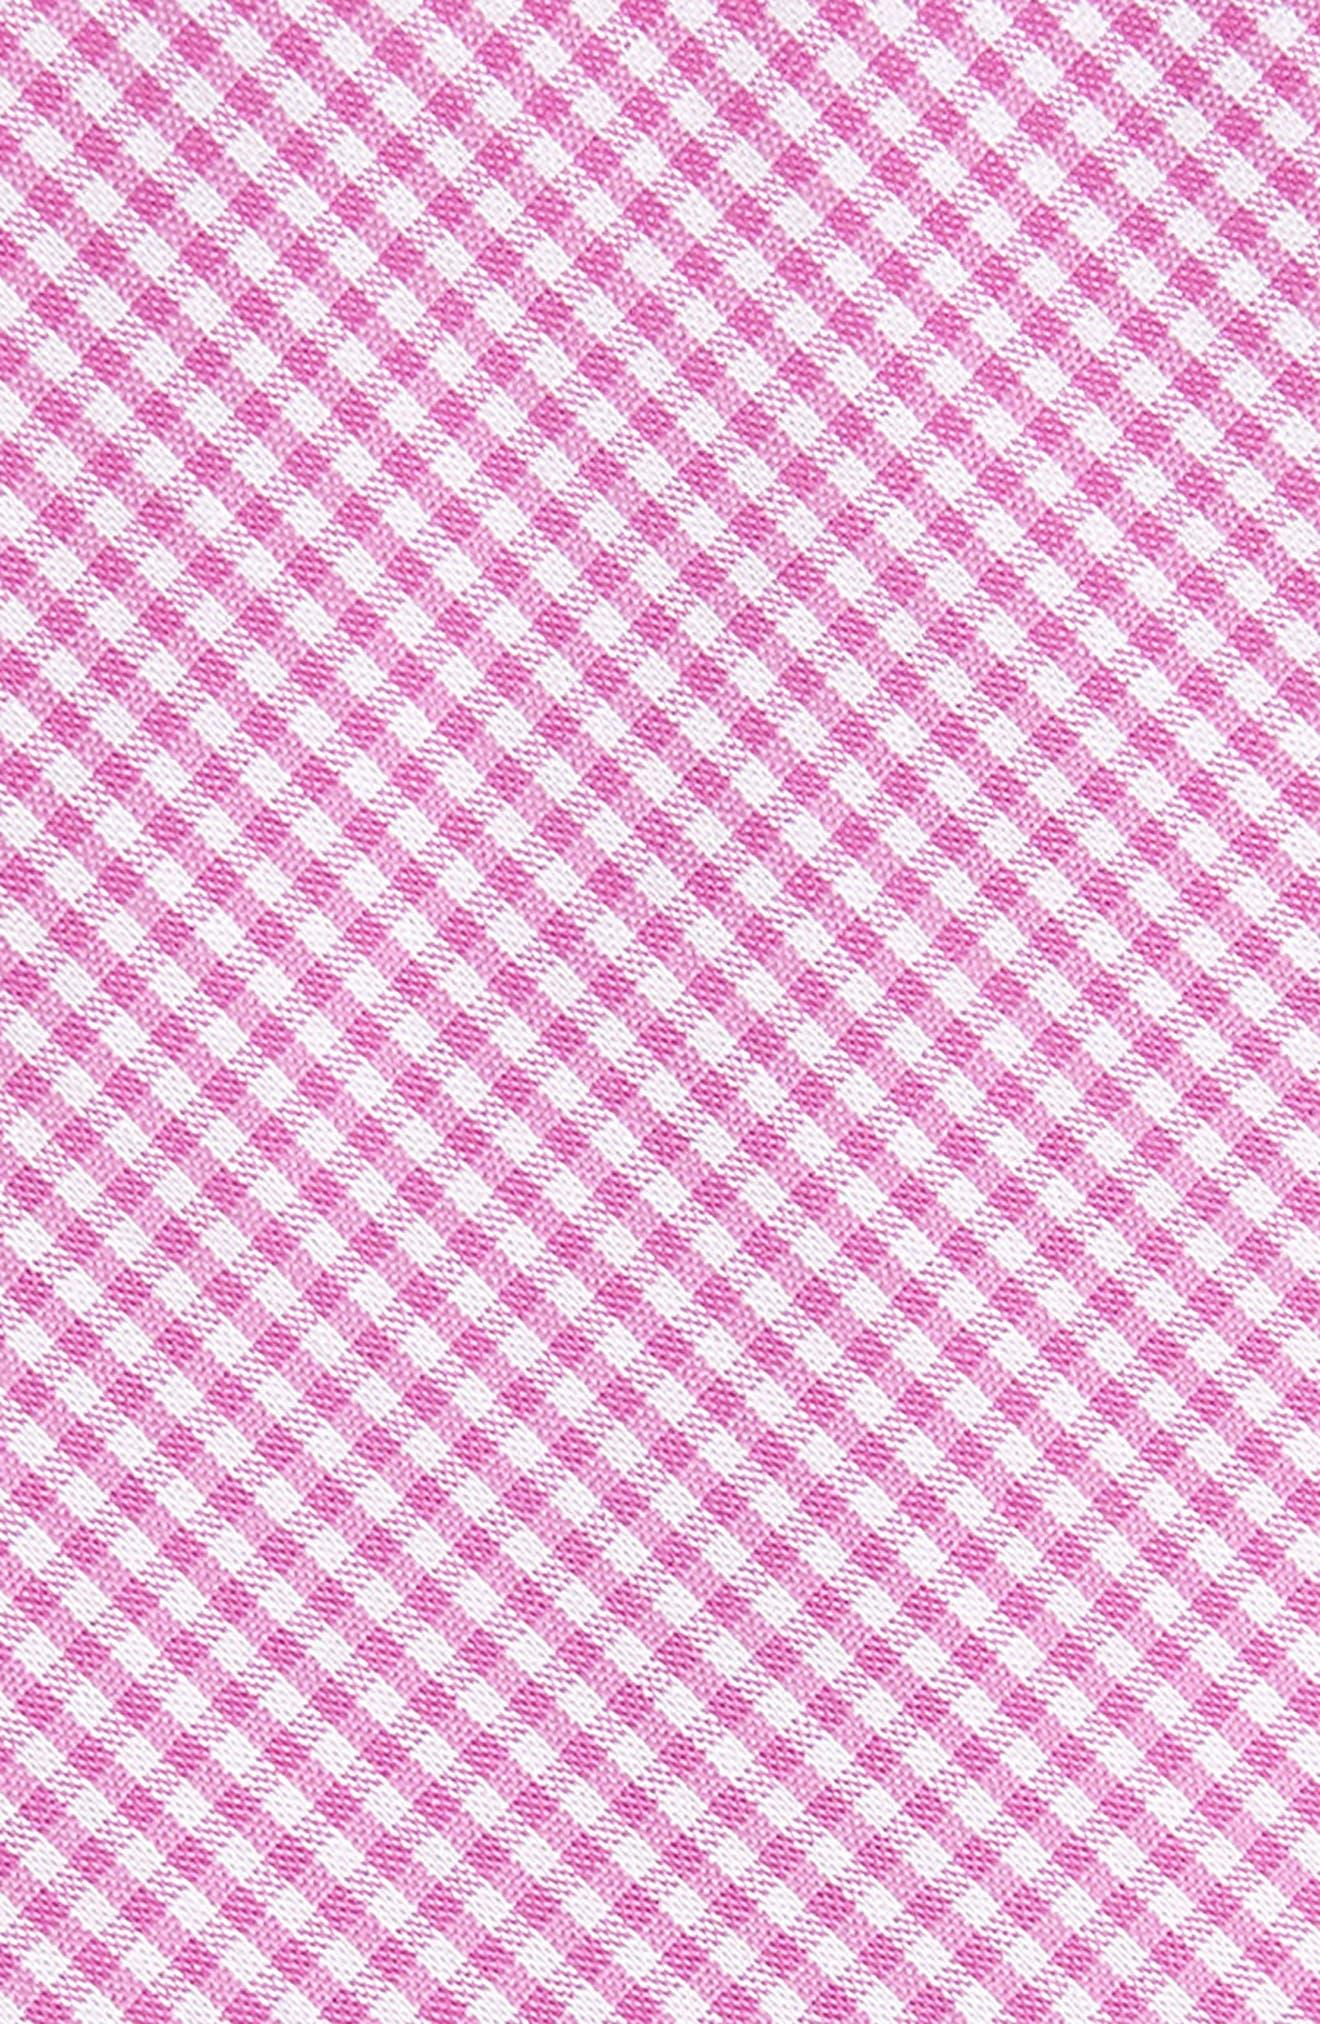 Sydney Check Cotton Skinny Tie,                             Alternate thumbnail 6, color,